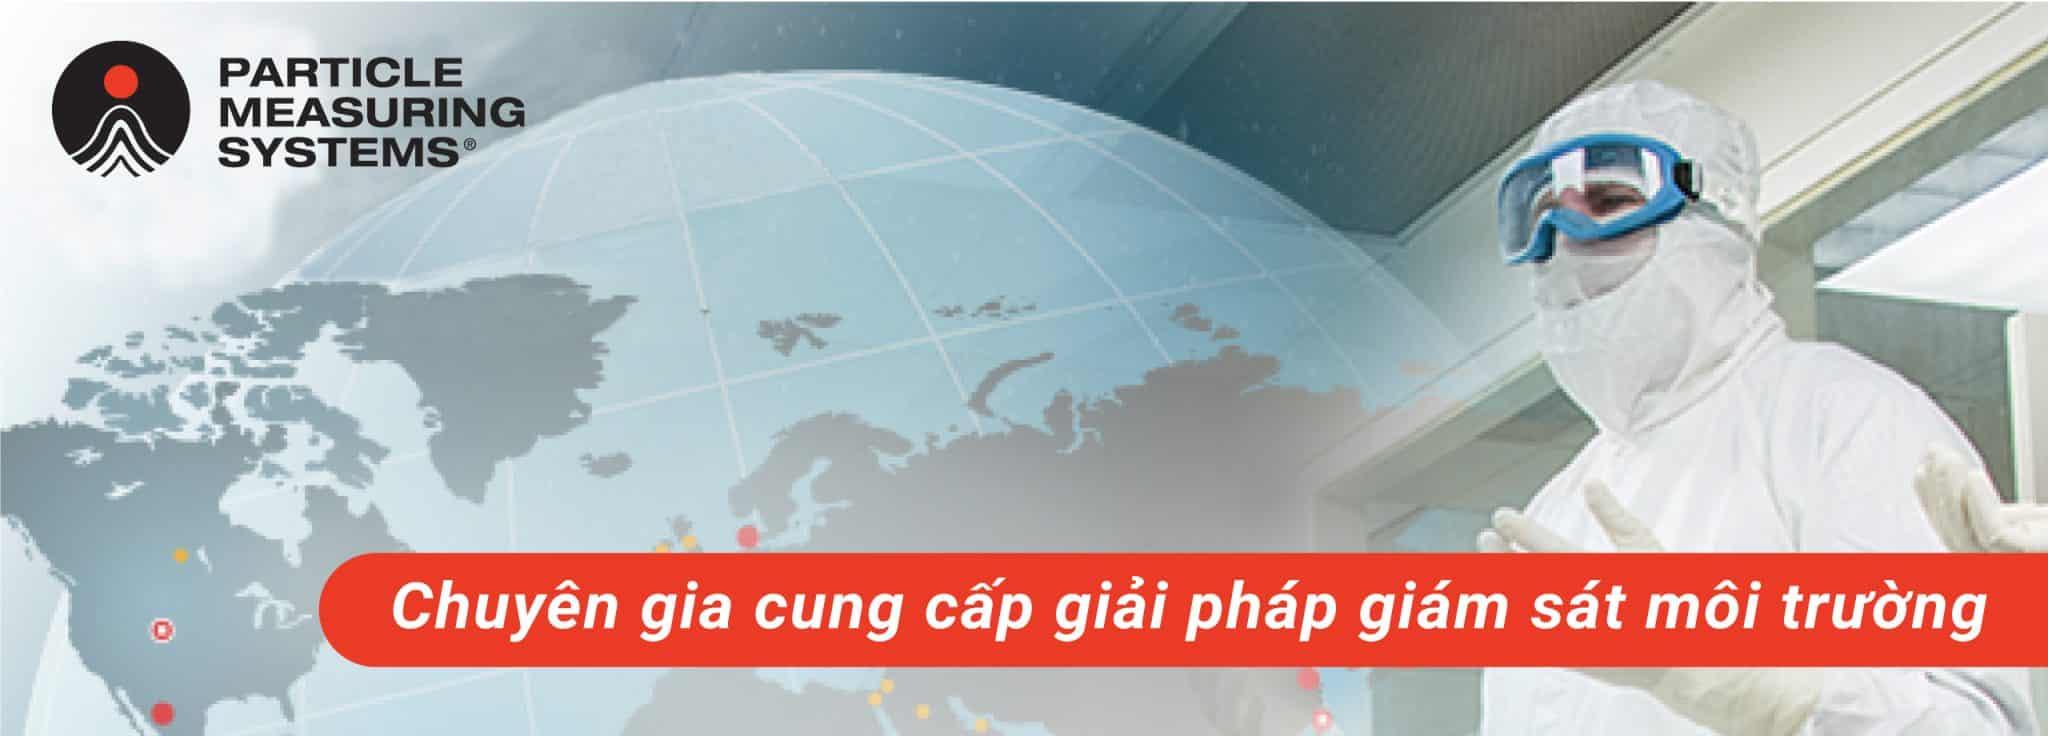 banner PMS new tieng viet